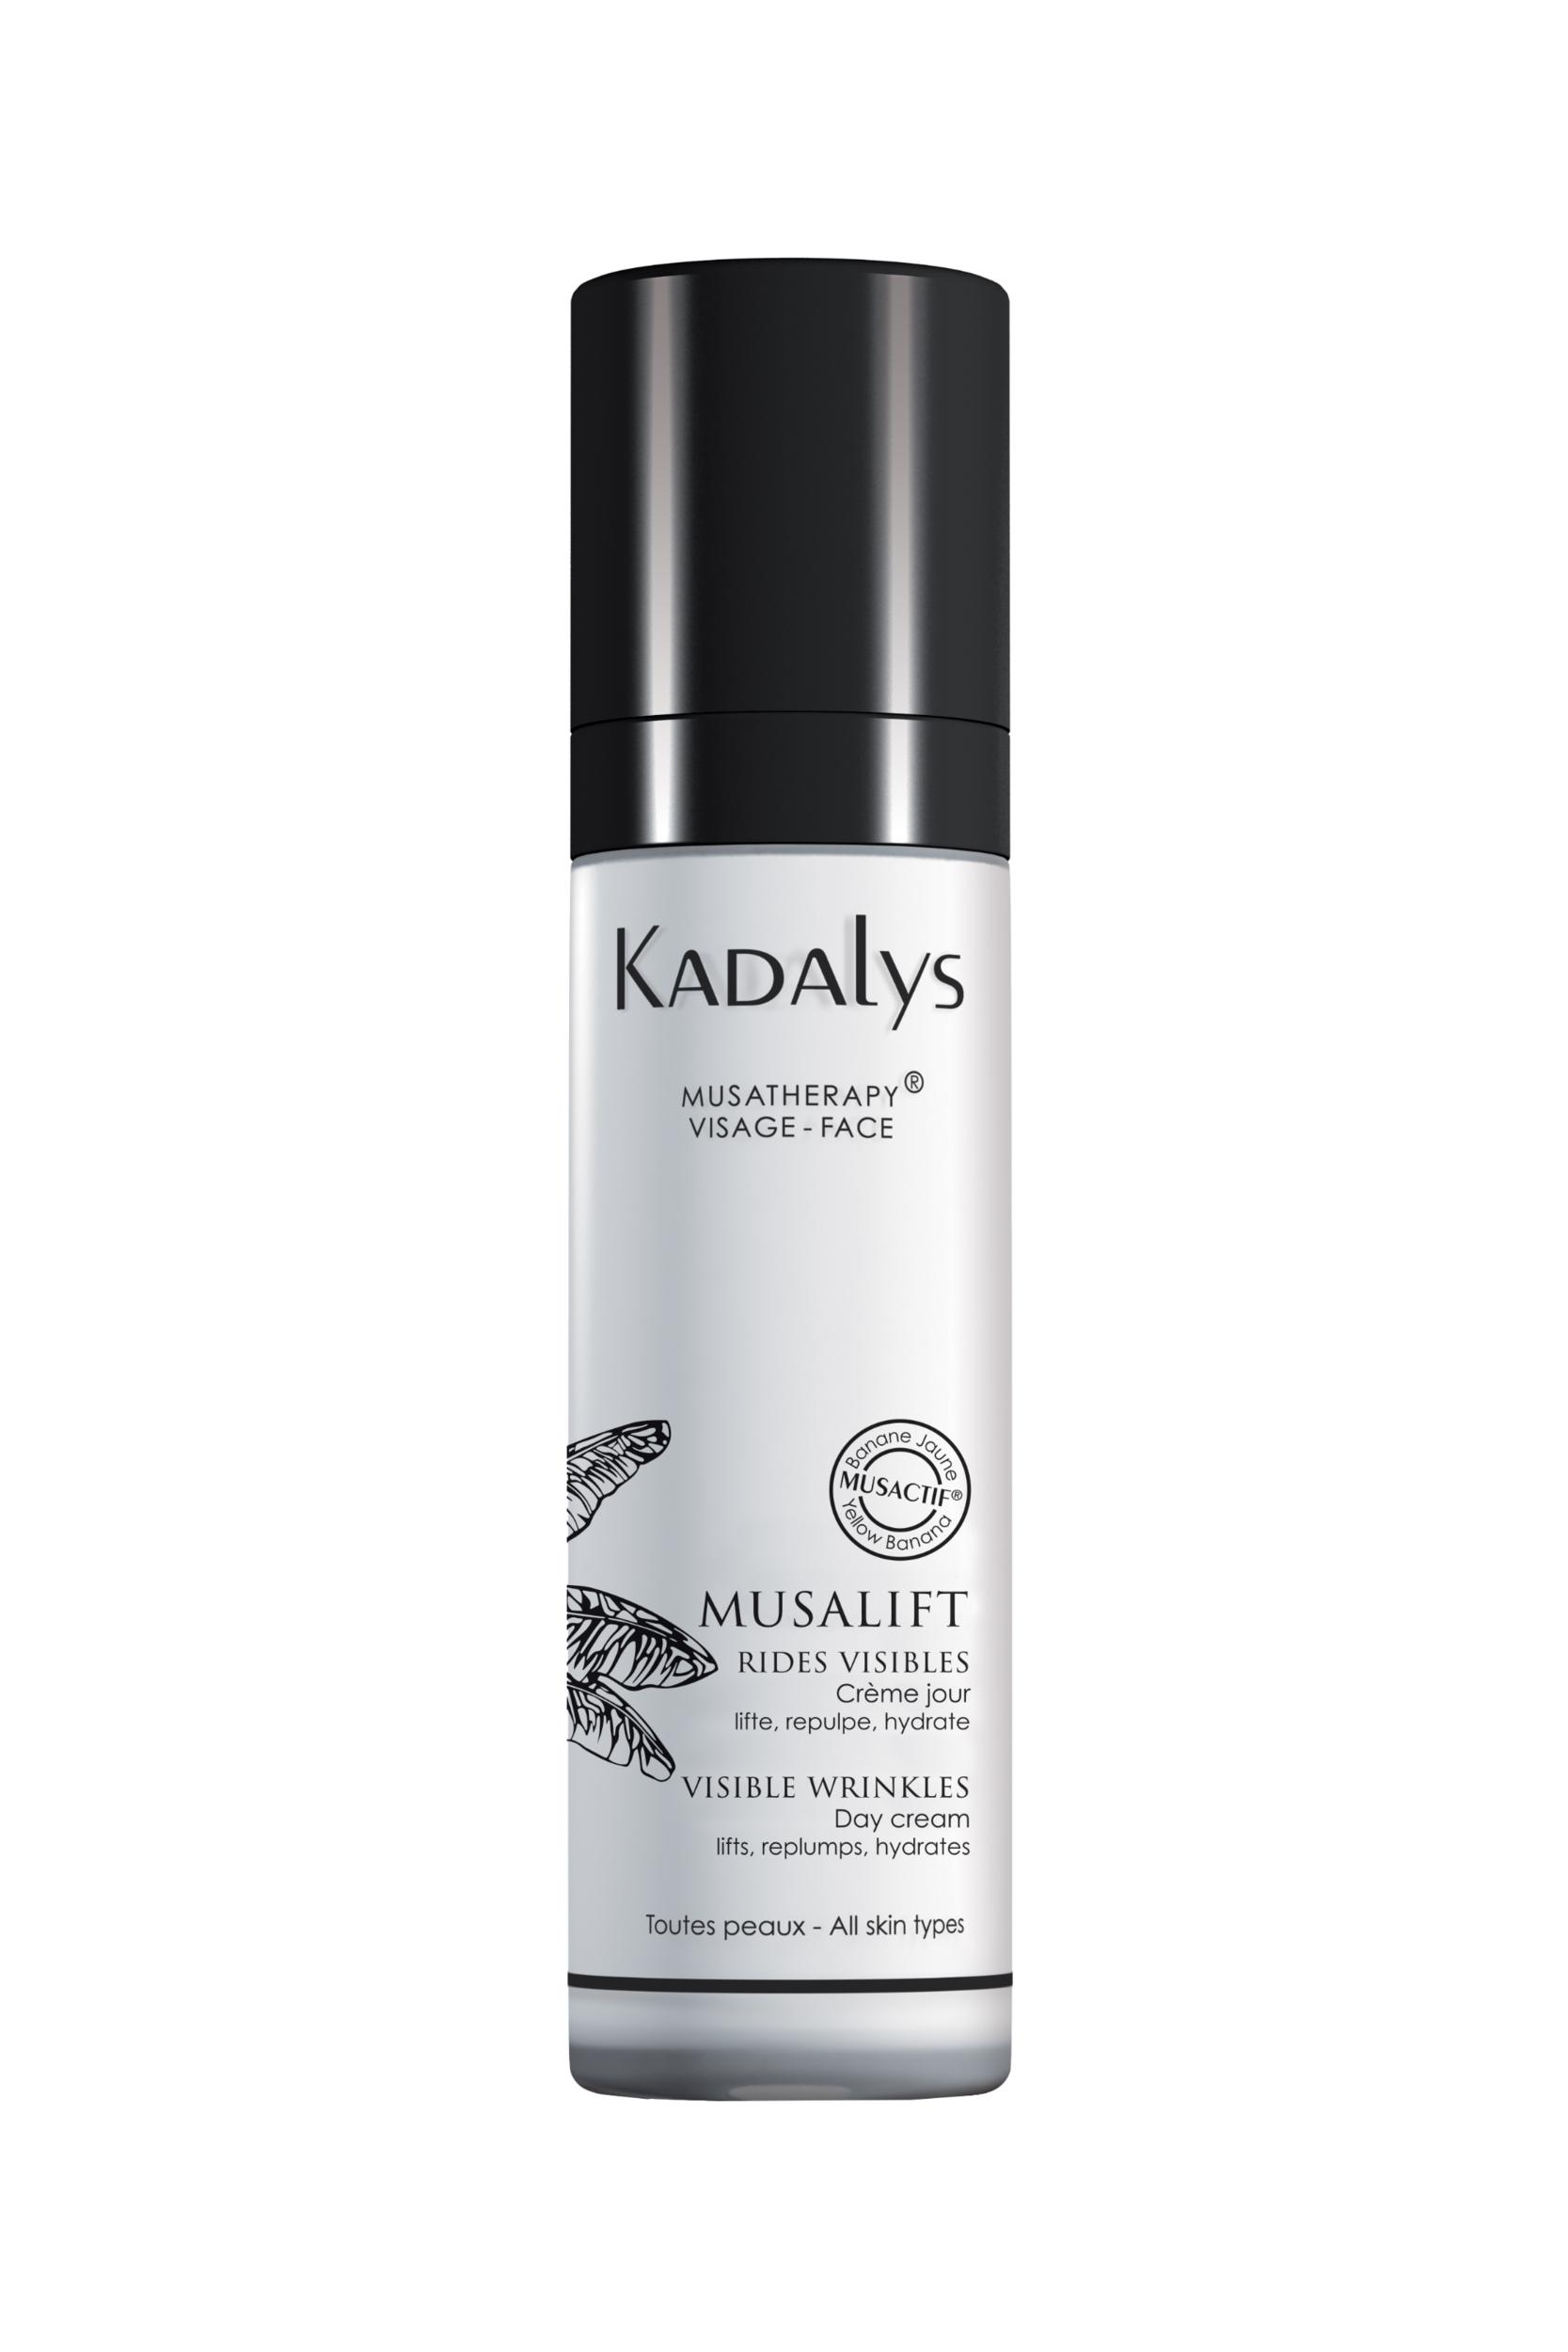 Kadalys-Musalift